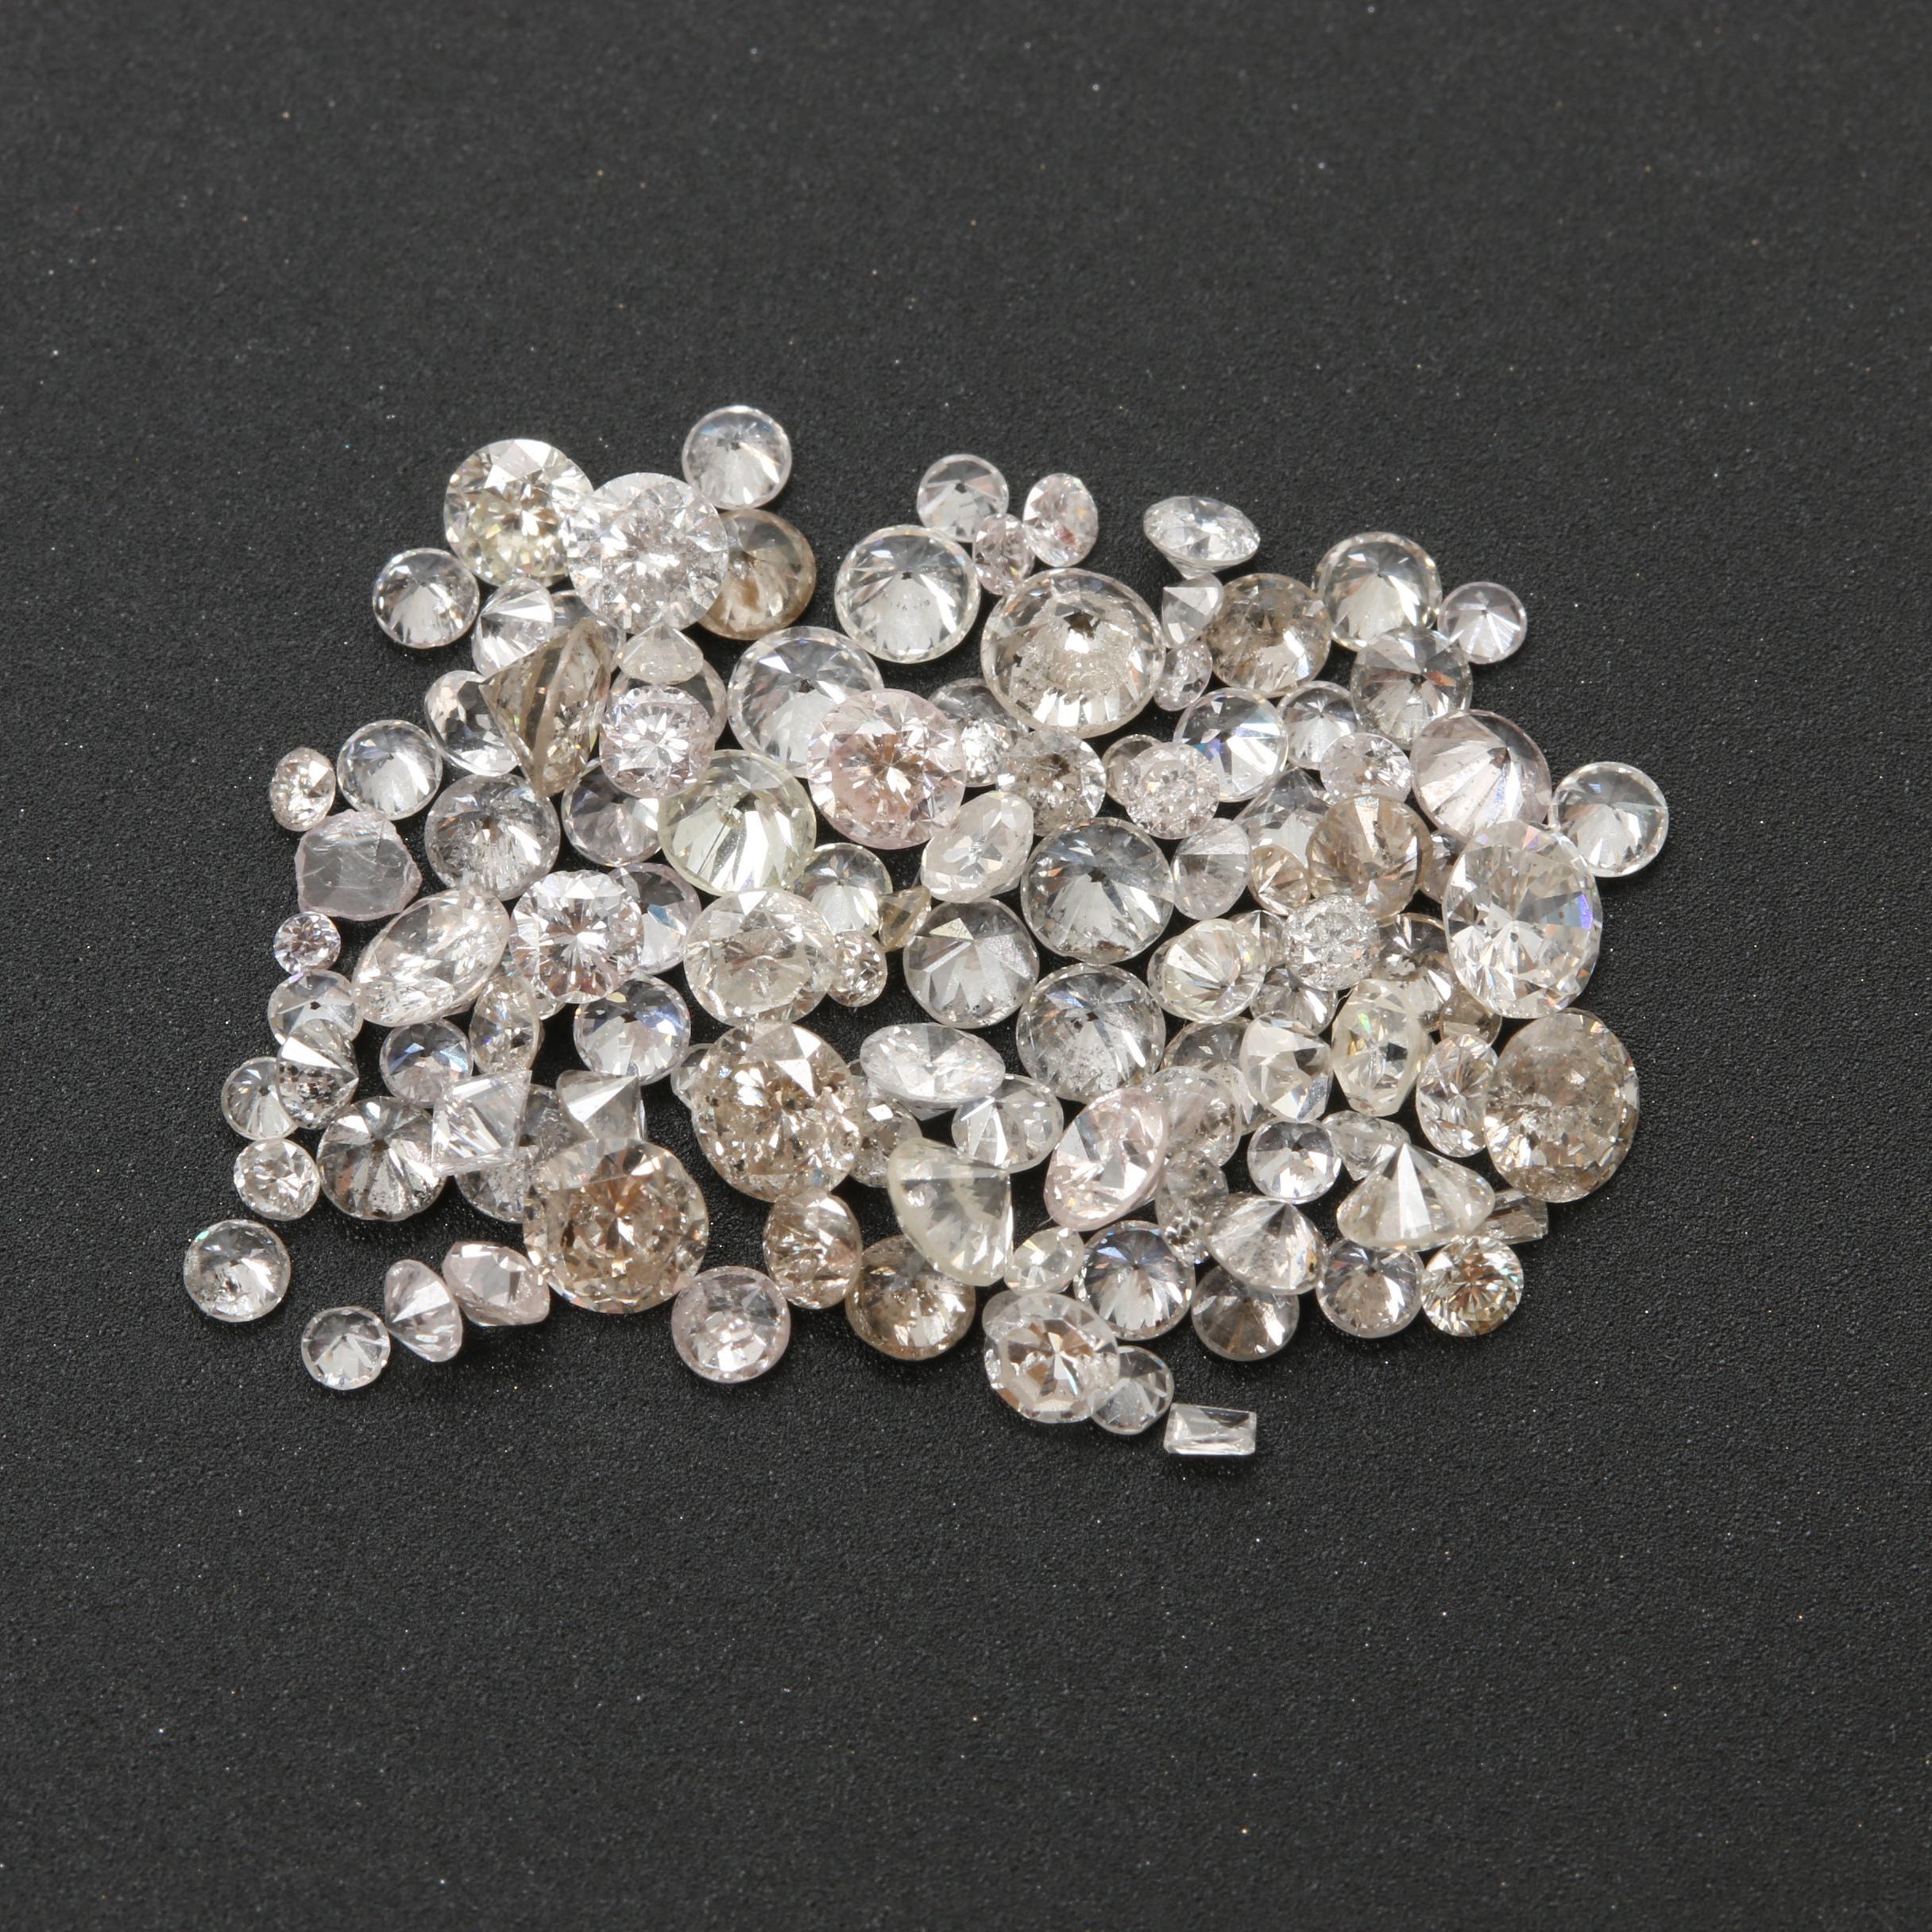 Loose 3.25 CTW Diamonds